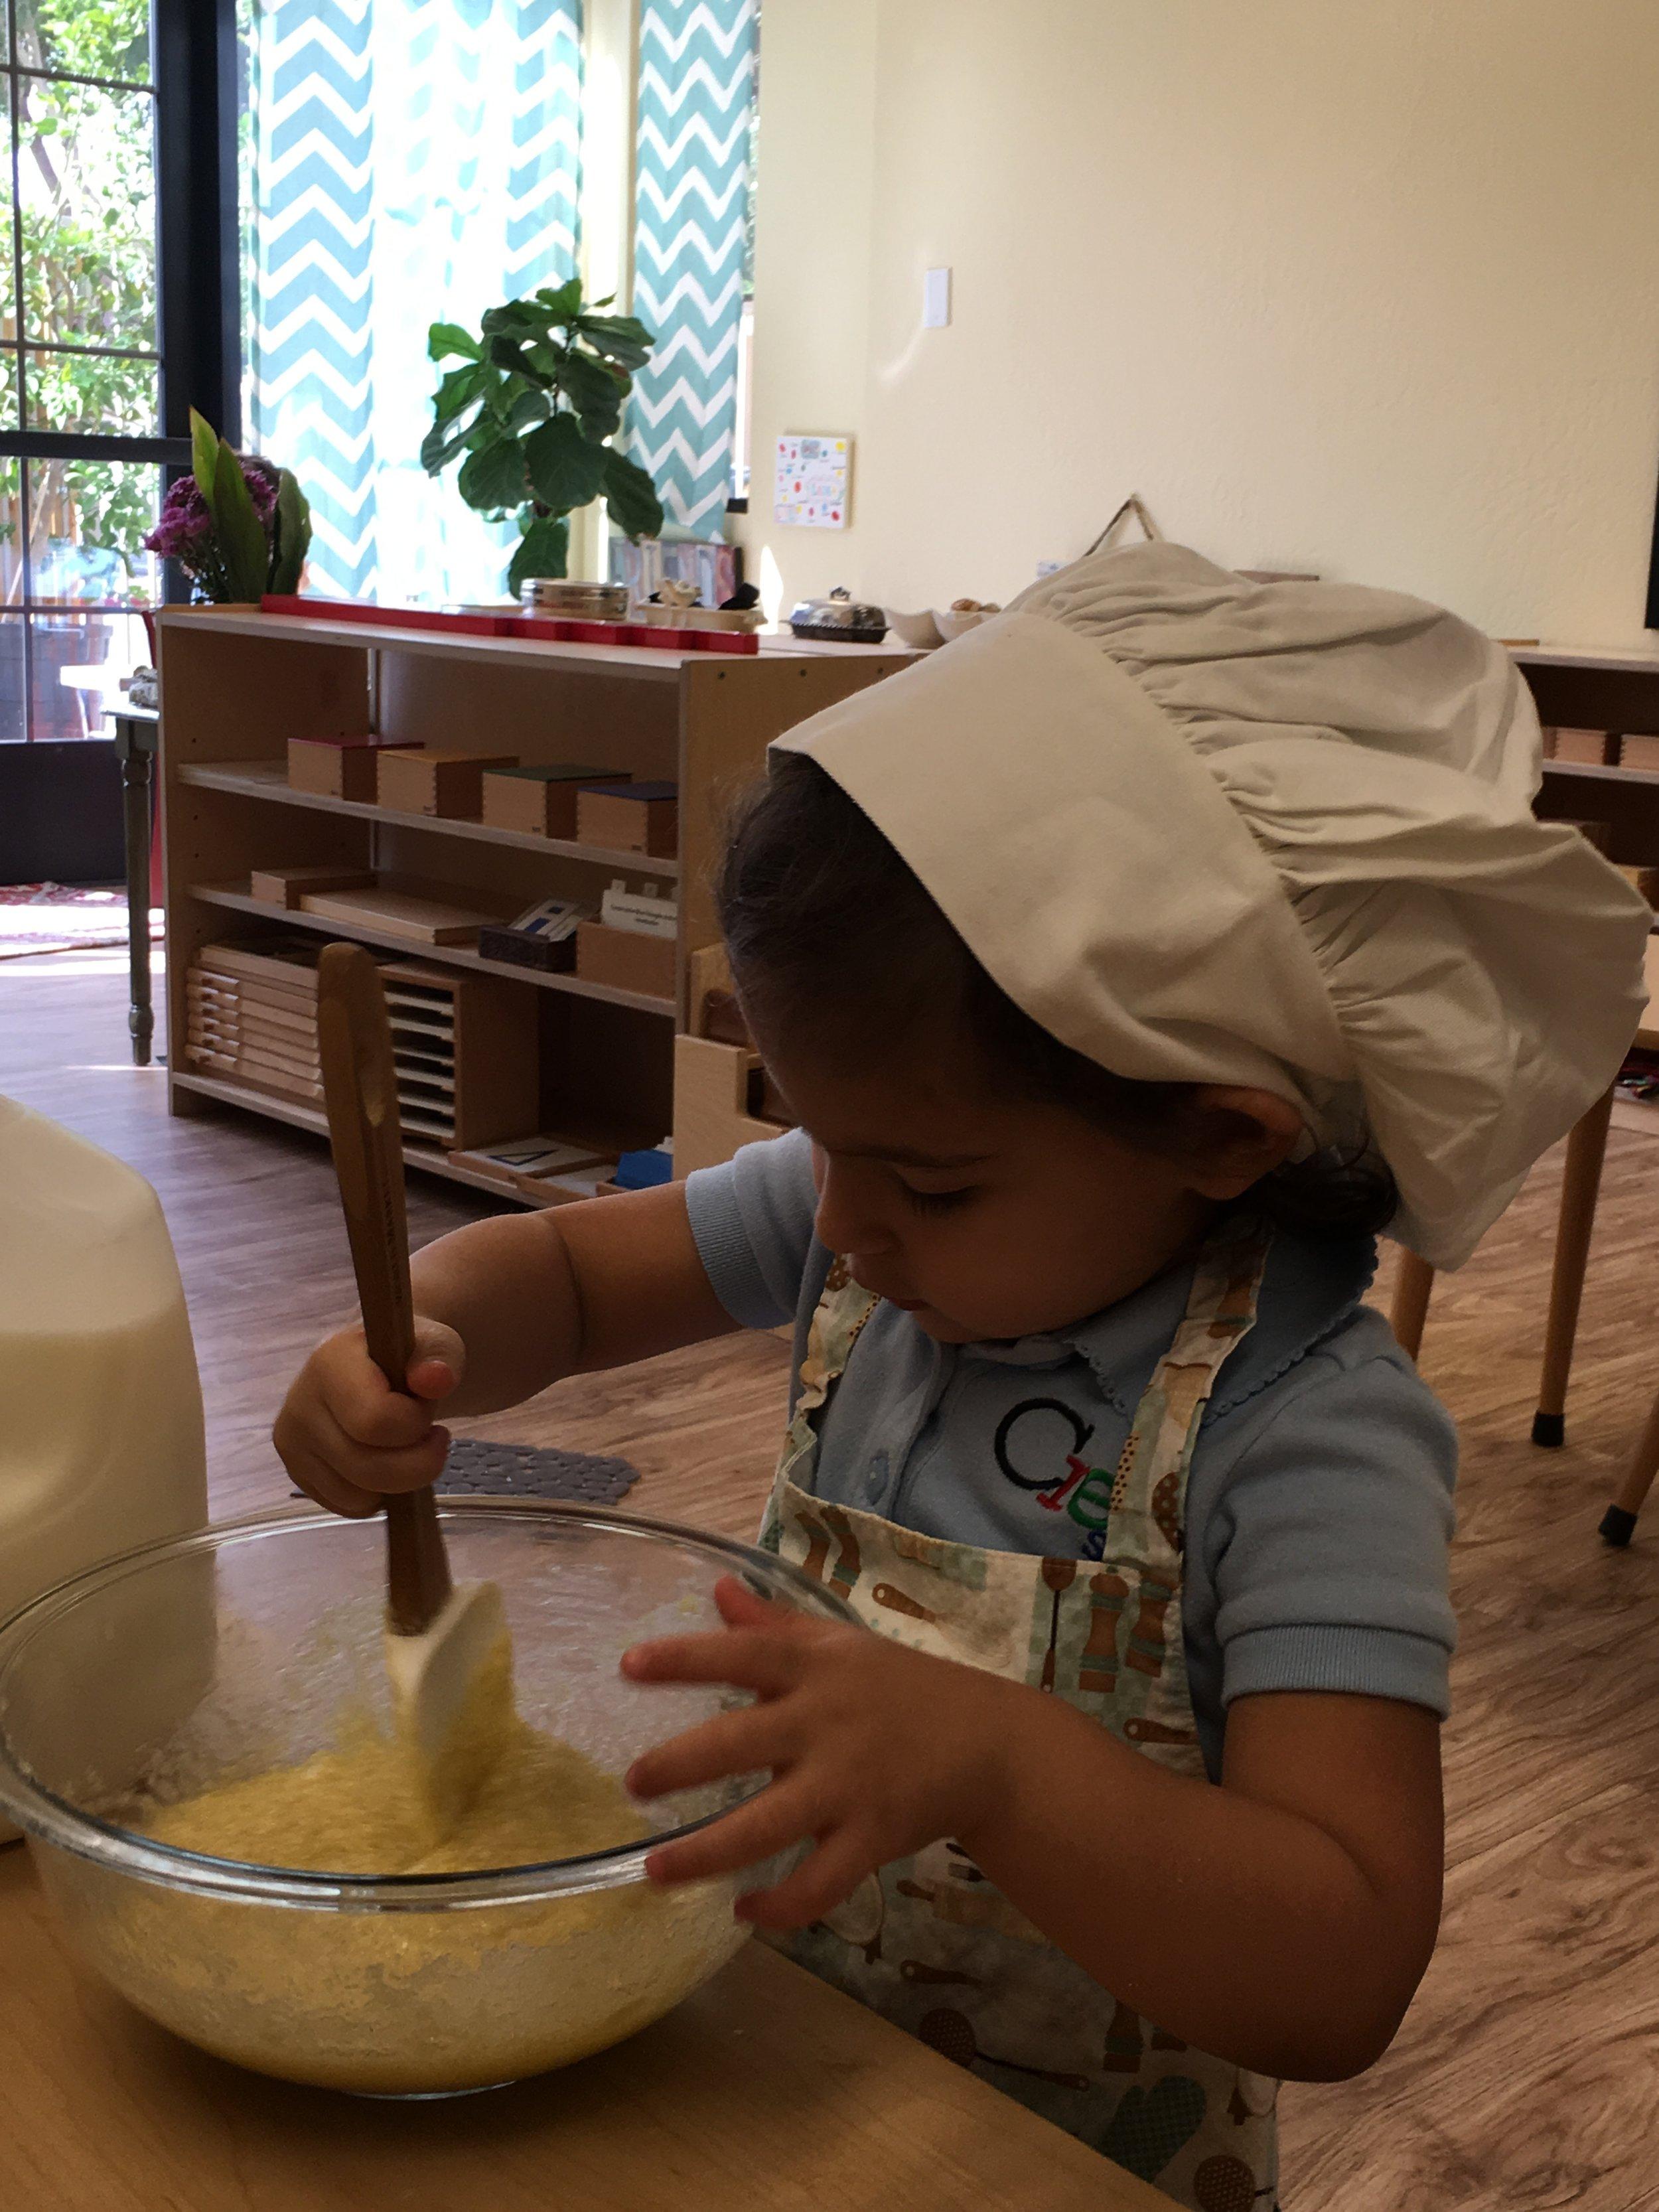 Baking muffins